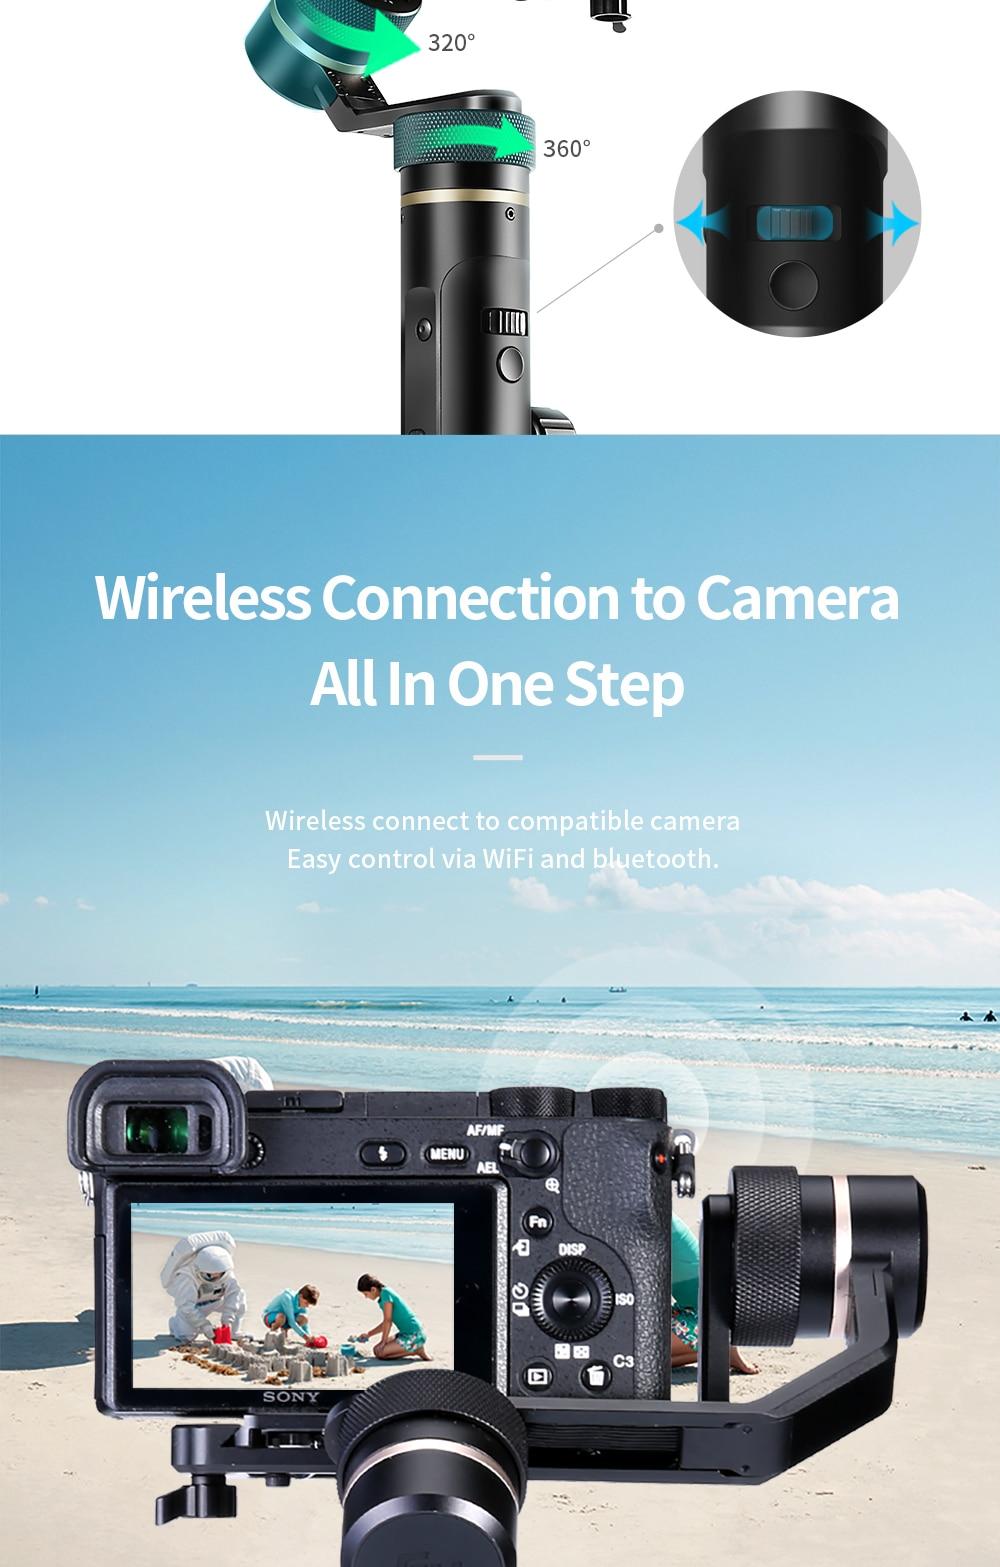 FeiyuTech G6 Plus 3-Axis Handheld Gimbal Stabilizer for Mirrorless Camera Pocket Camera GoPro Smartphone Payload 800g Feiyu G6P 8